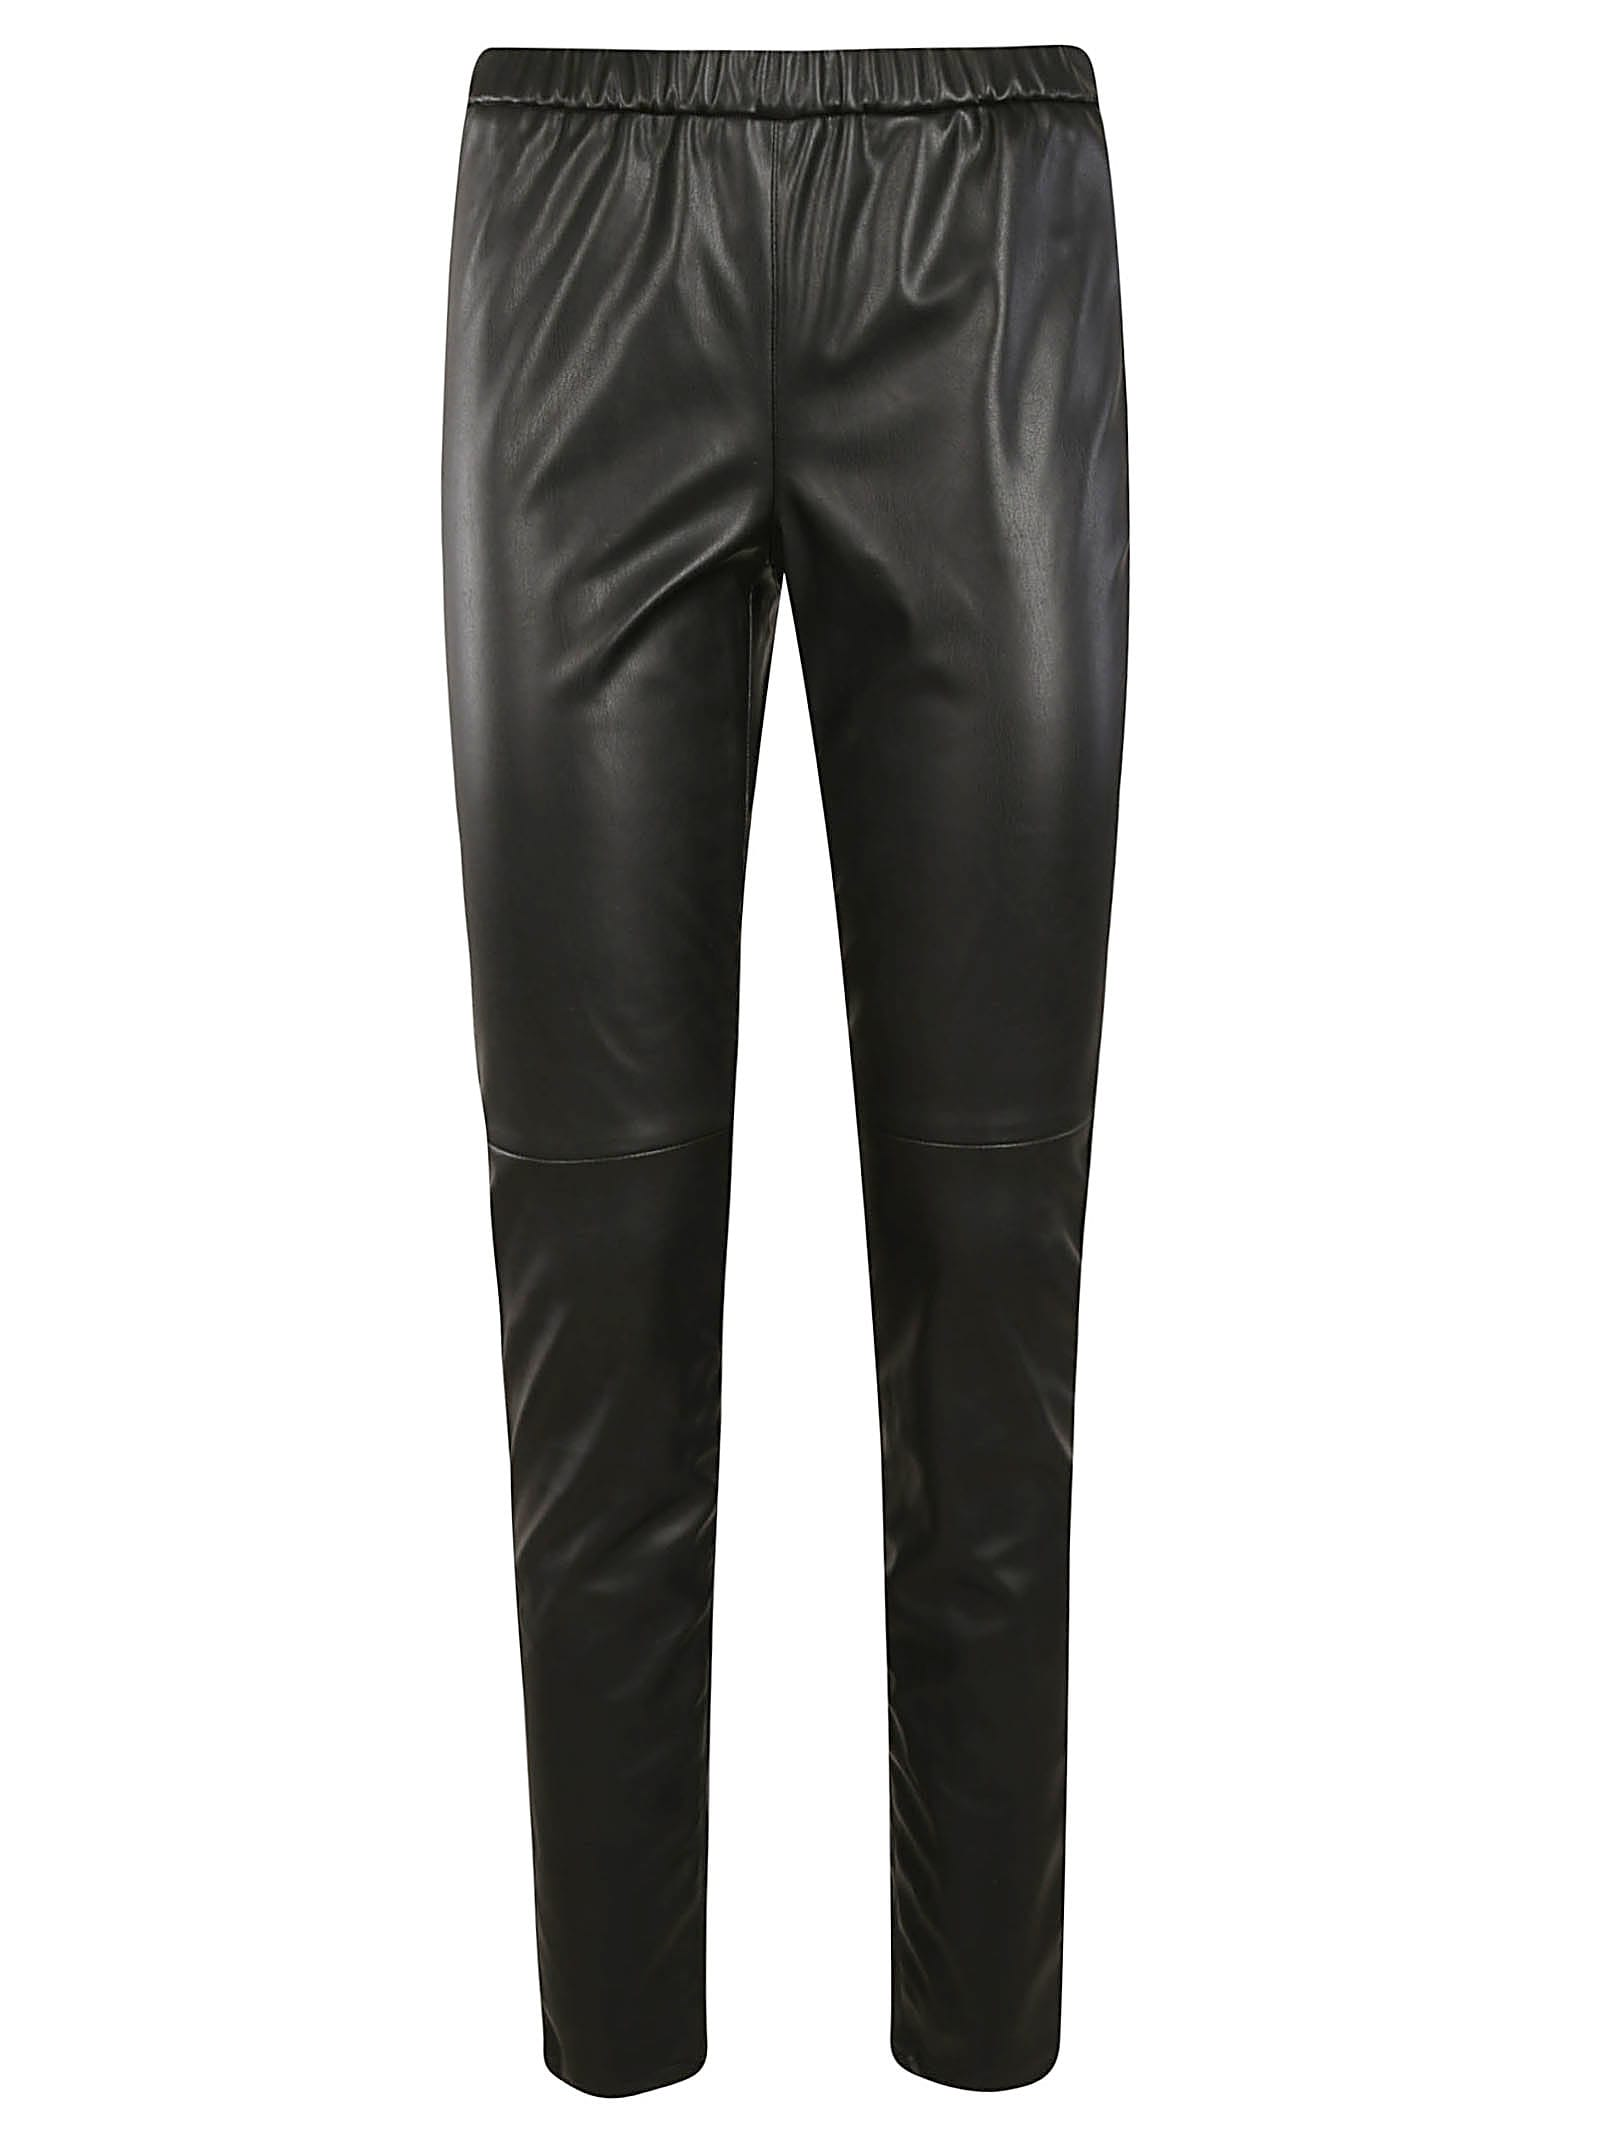 Michael Kors Skinny Fit Trousers